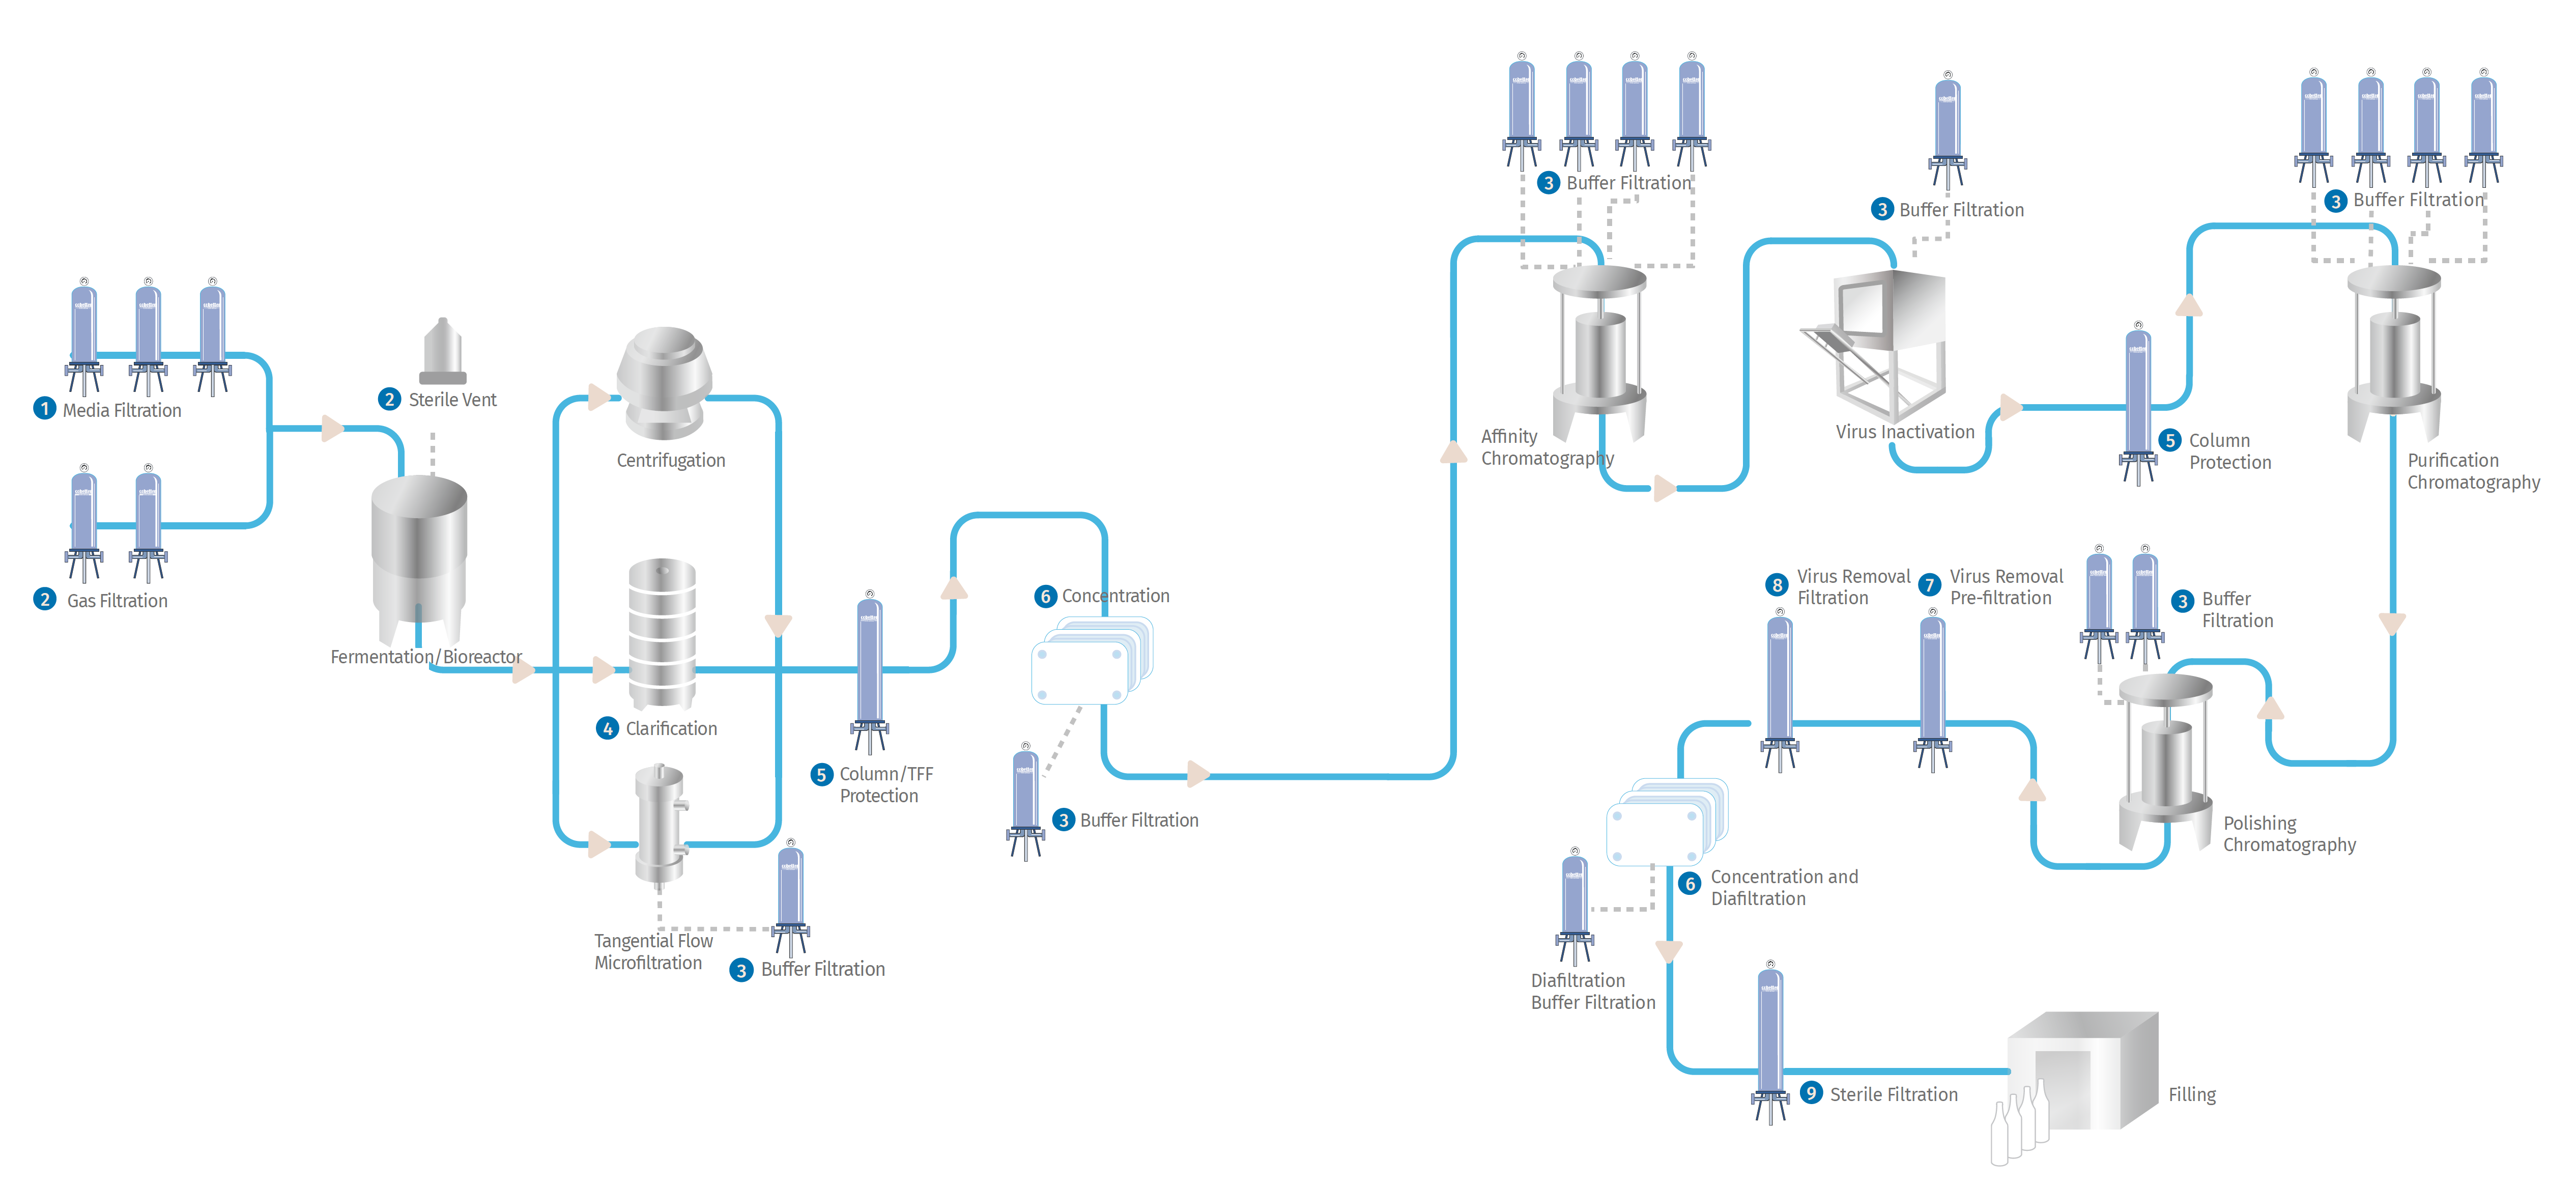 Flow diagramm of boiprocess